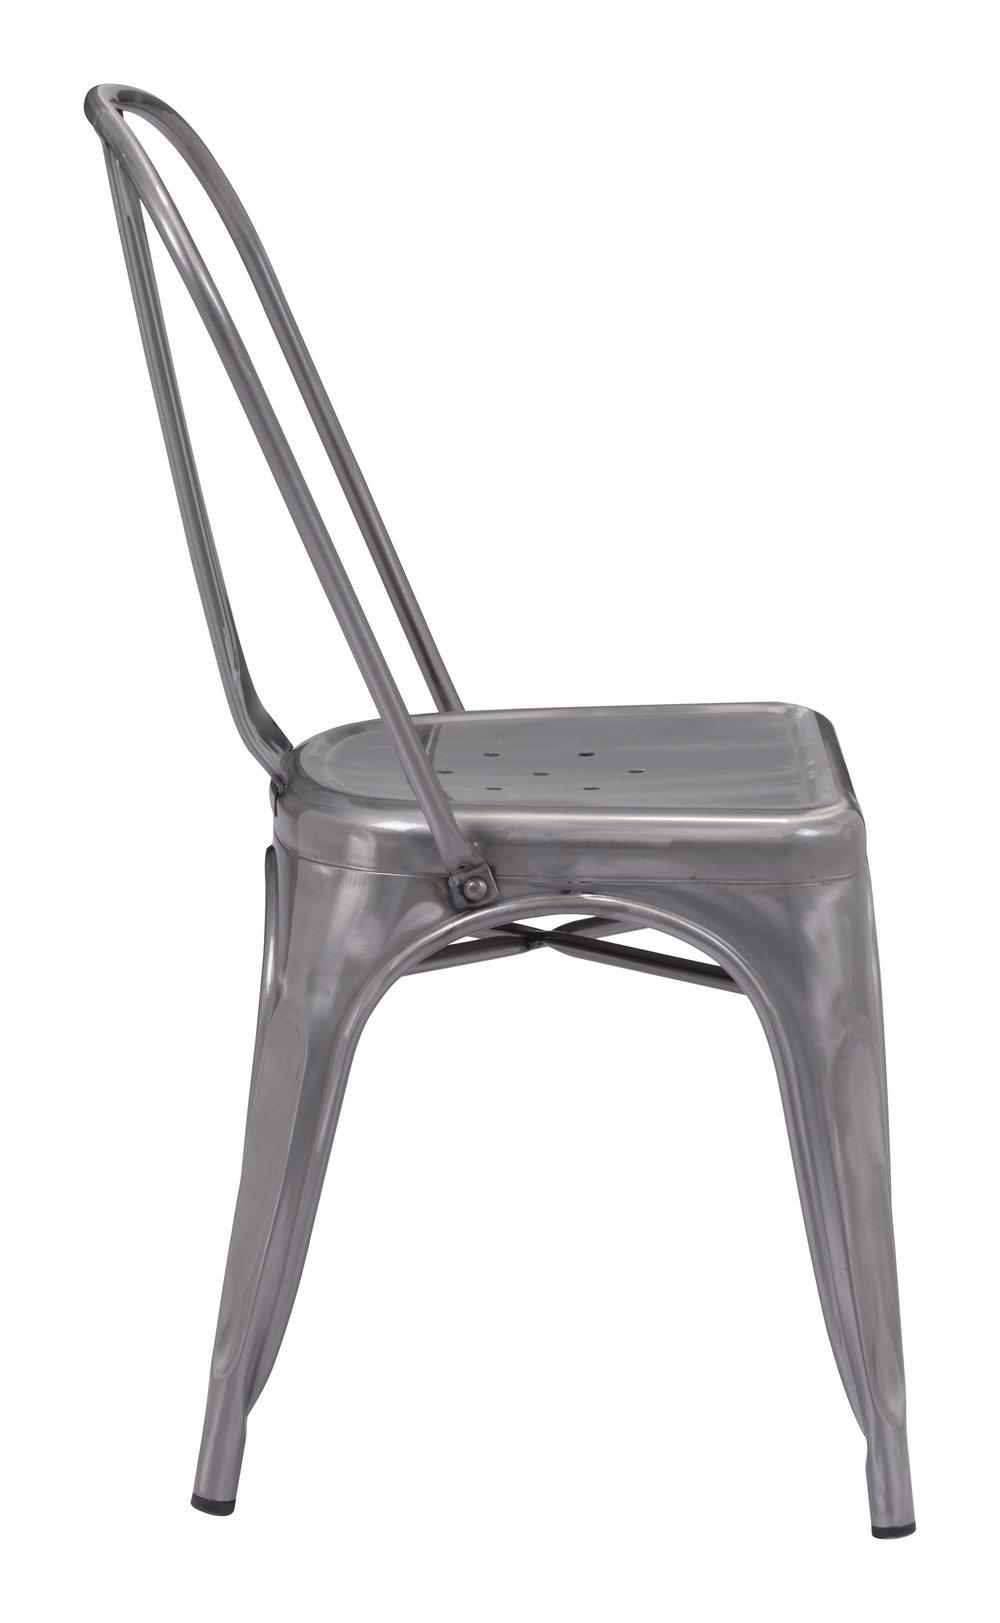 Zuo Modern Contemporary - Elio Dining Chair - Set of 2 - Gunmetal